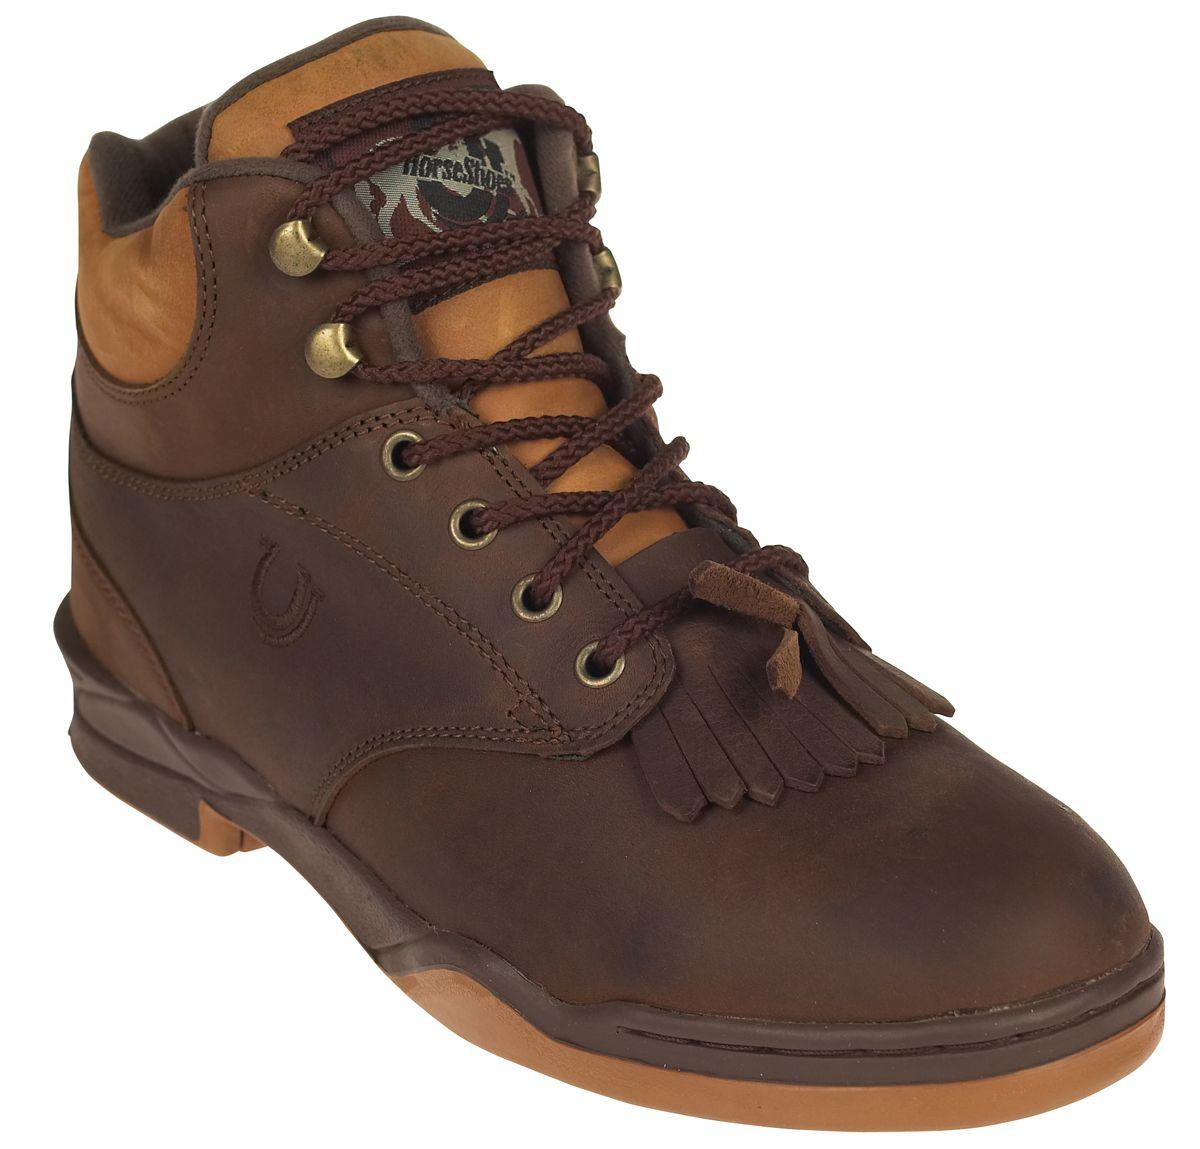 d4744152cb5 Mens Classic Original Horseshoe Style   valleyvet.com   Men's Boots ...